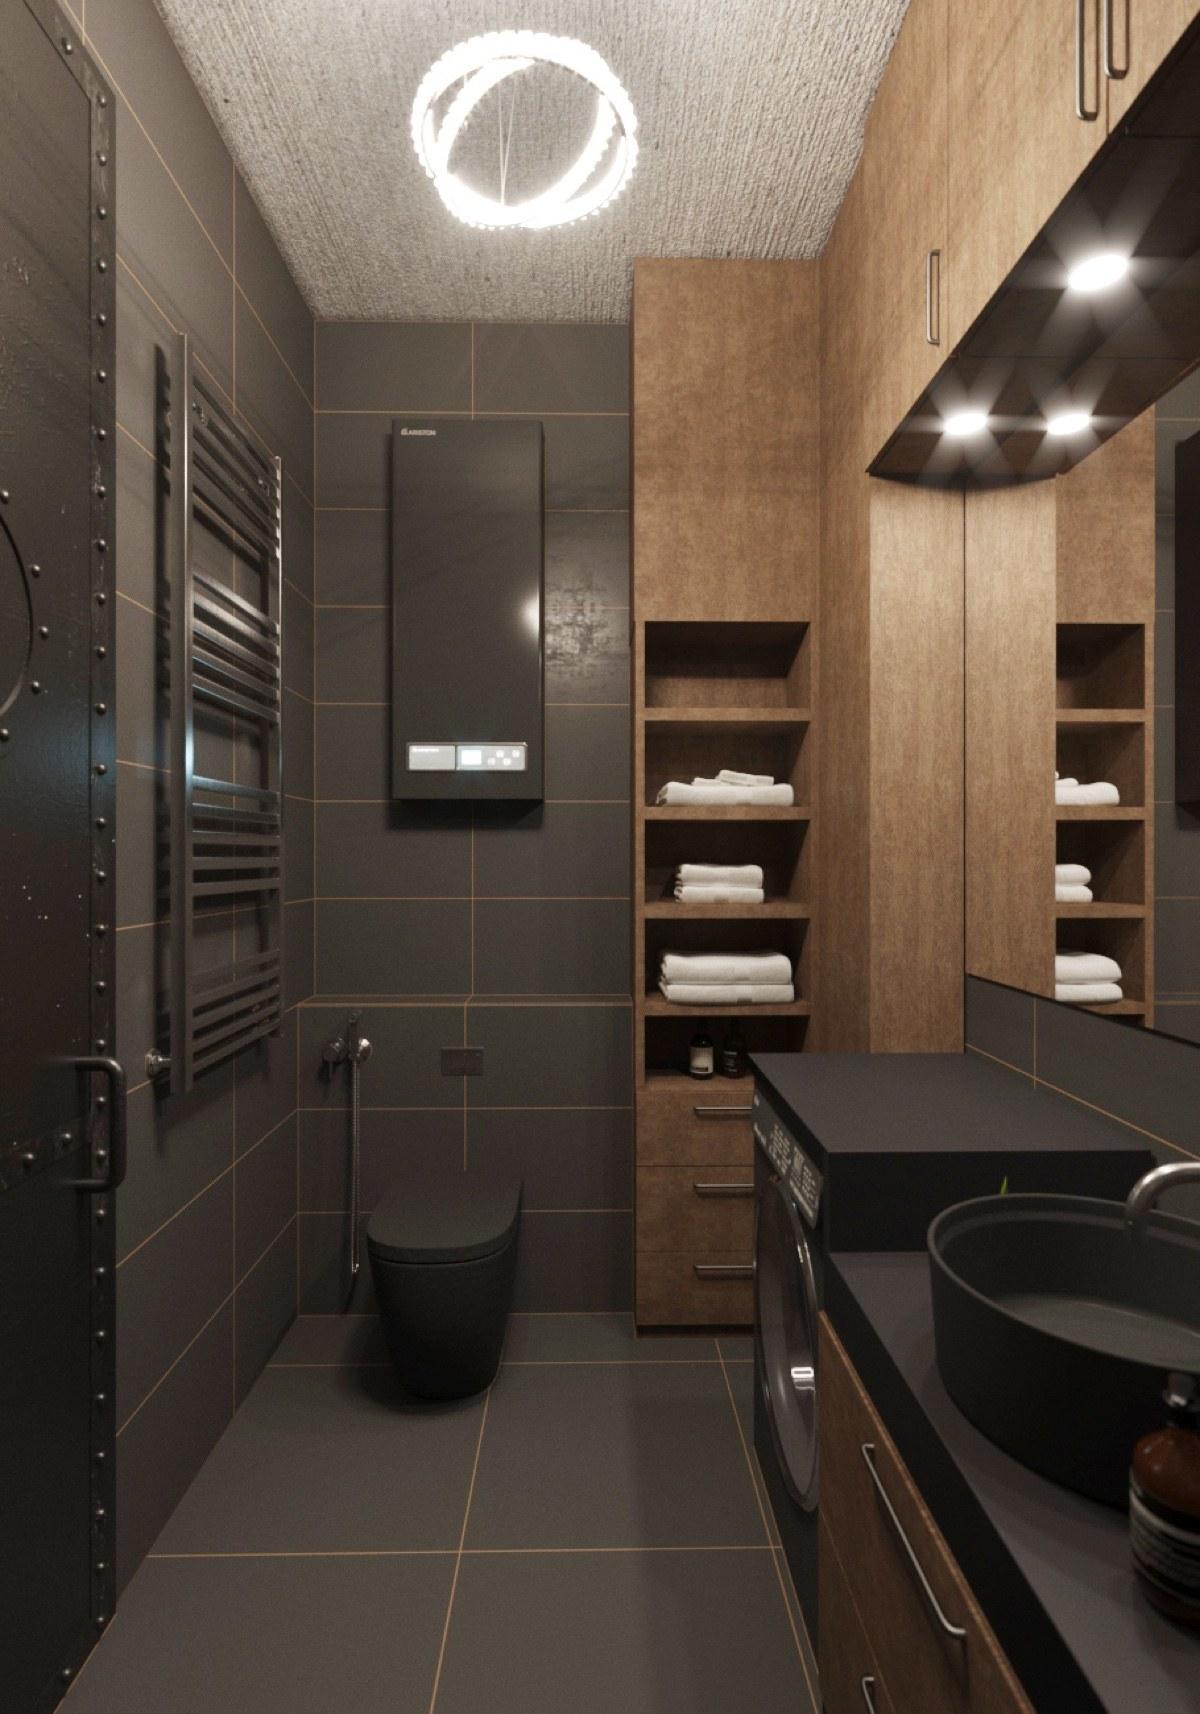 Trendy Apartment Decor